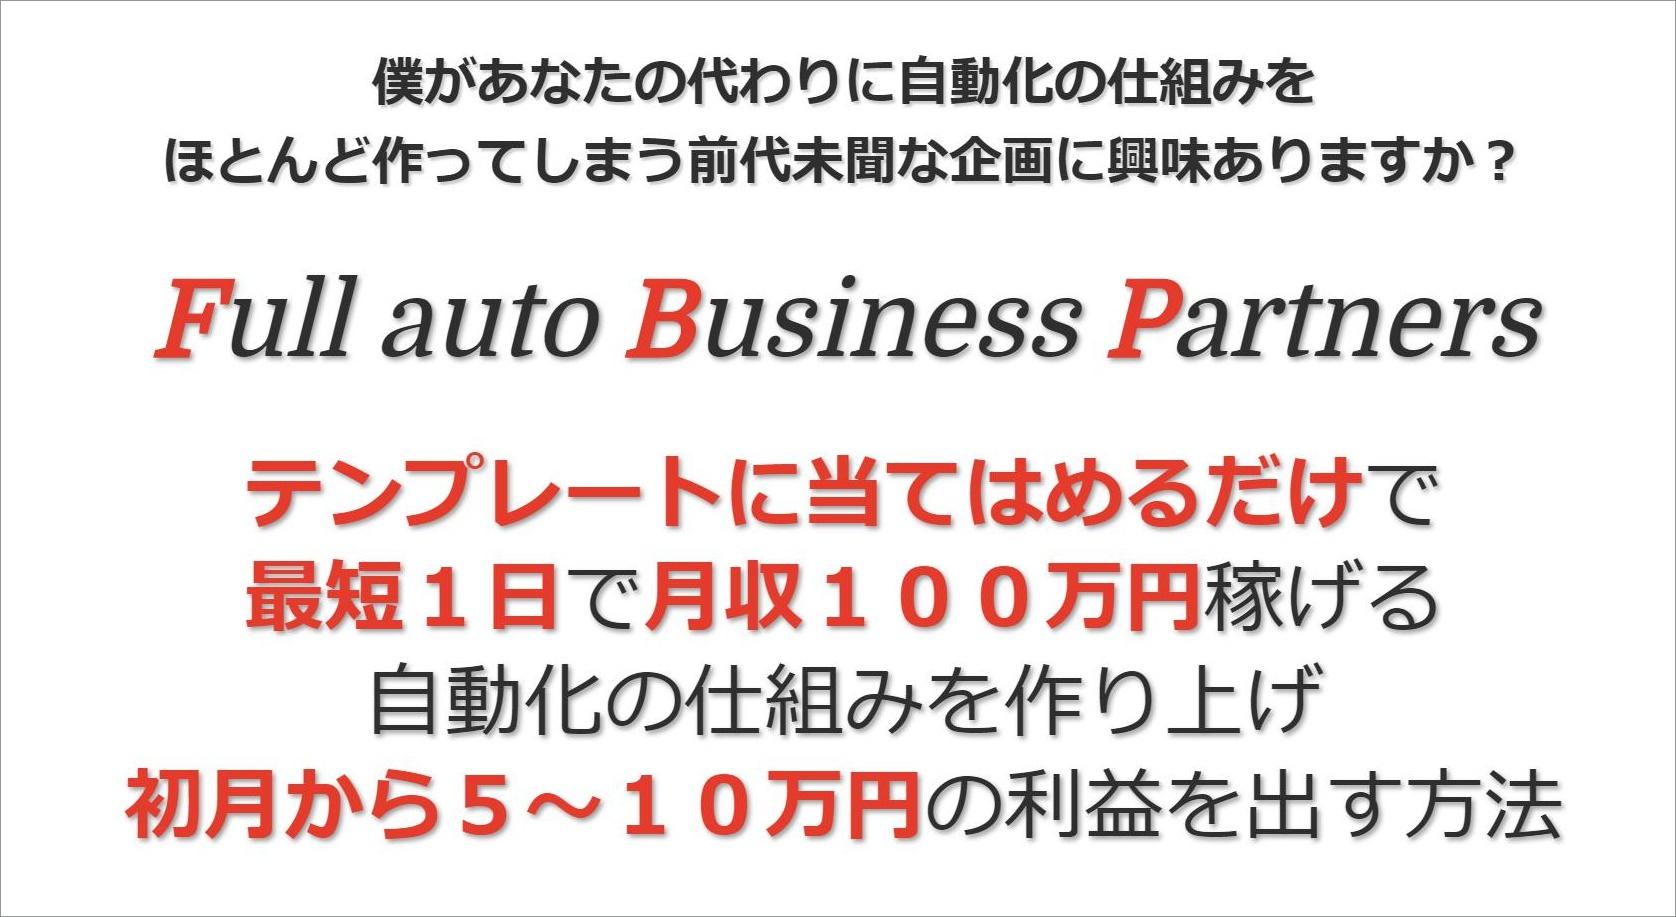 FBP(自動化ビジネスマスタープロジェクト)